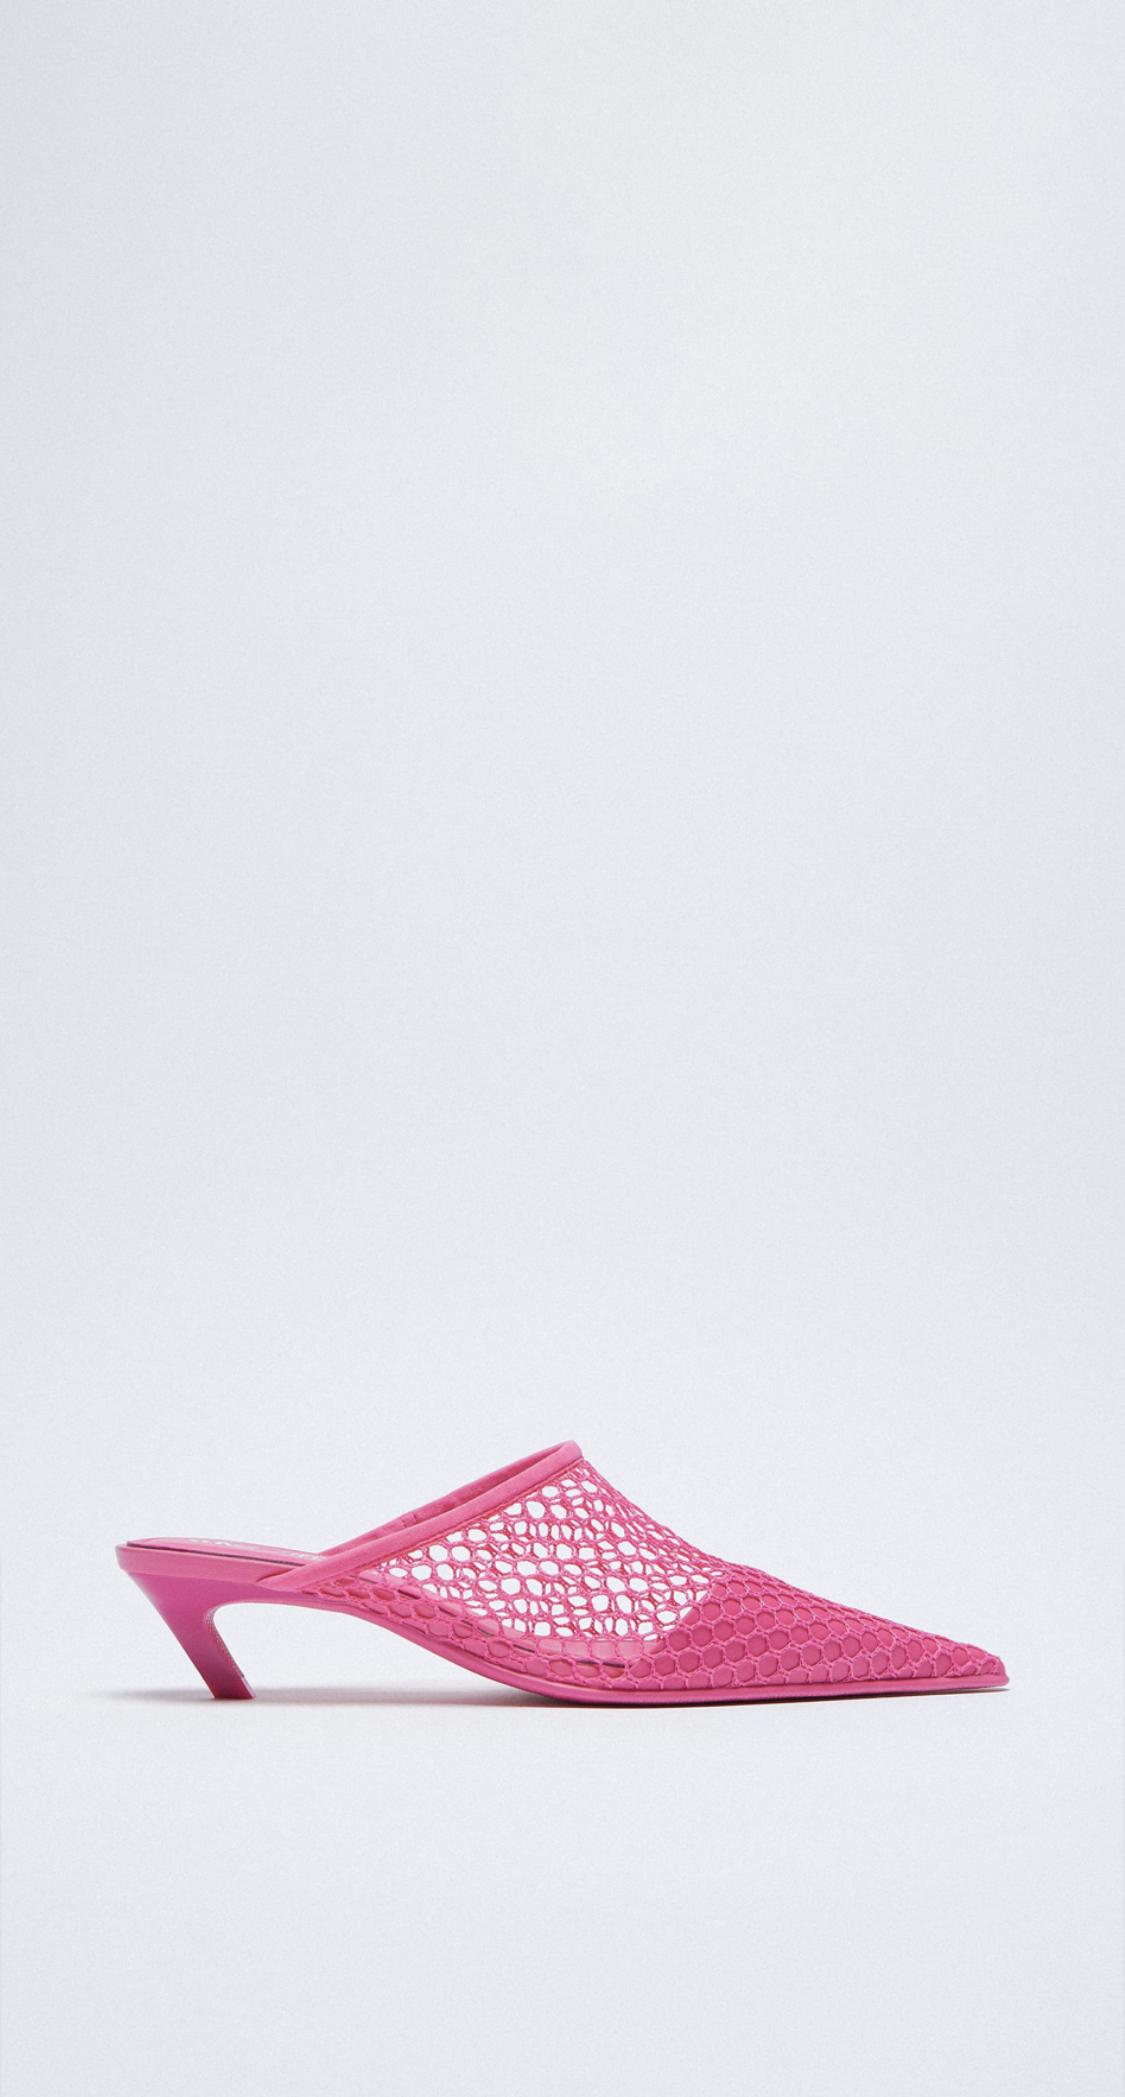 giày hở gót zara